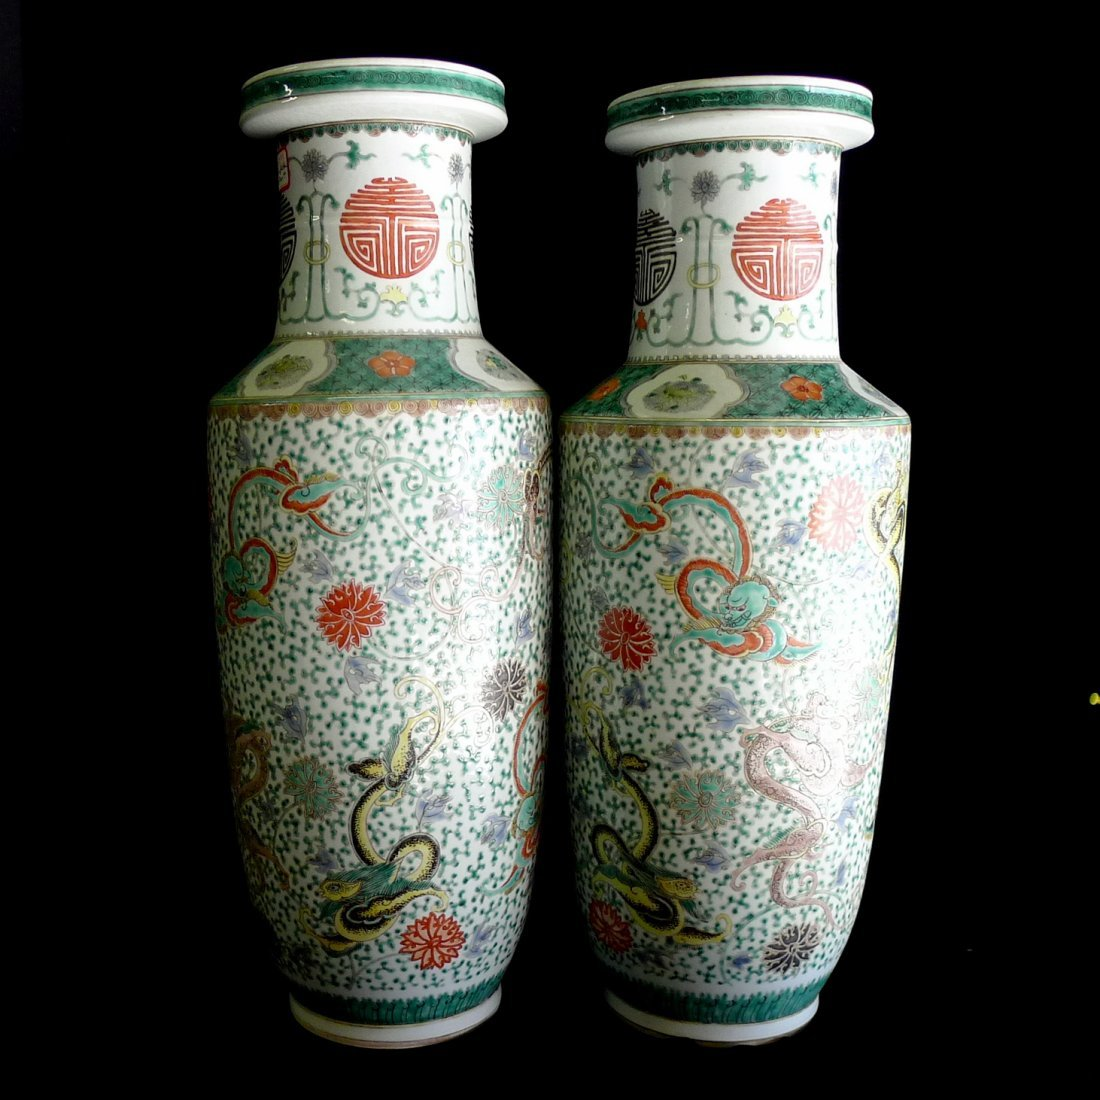 Pair of Chinese Wucai Porcelain Dragon Vases